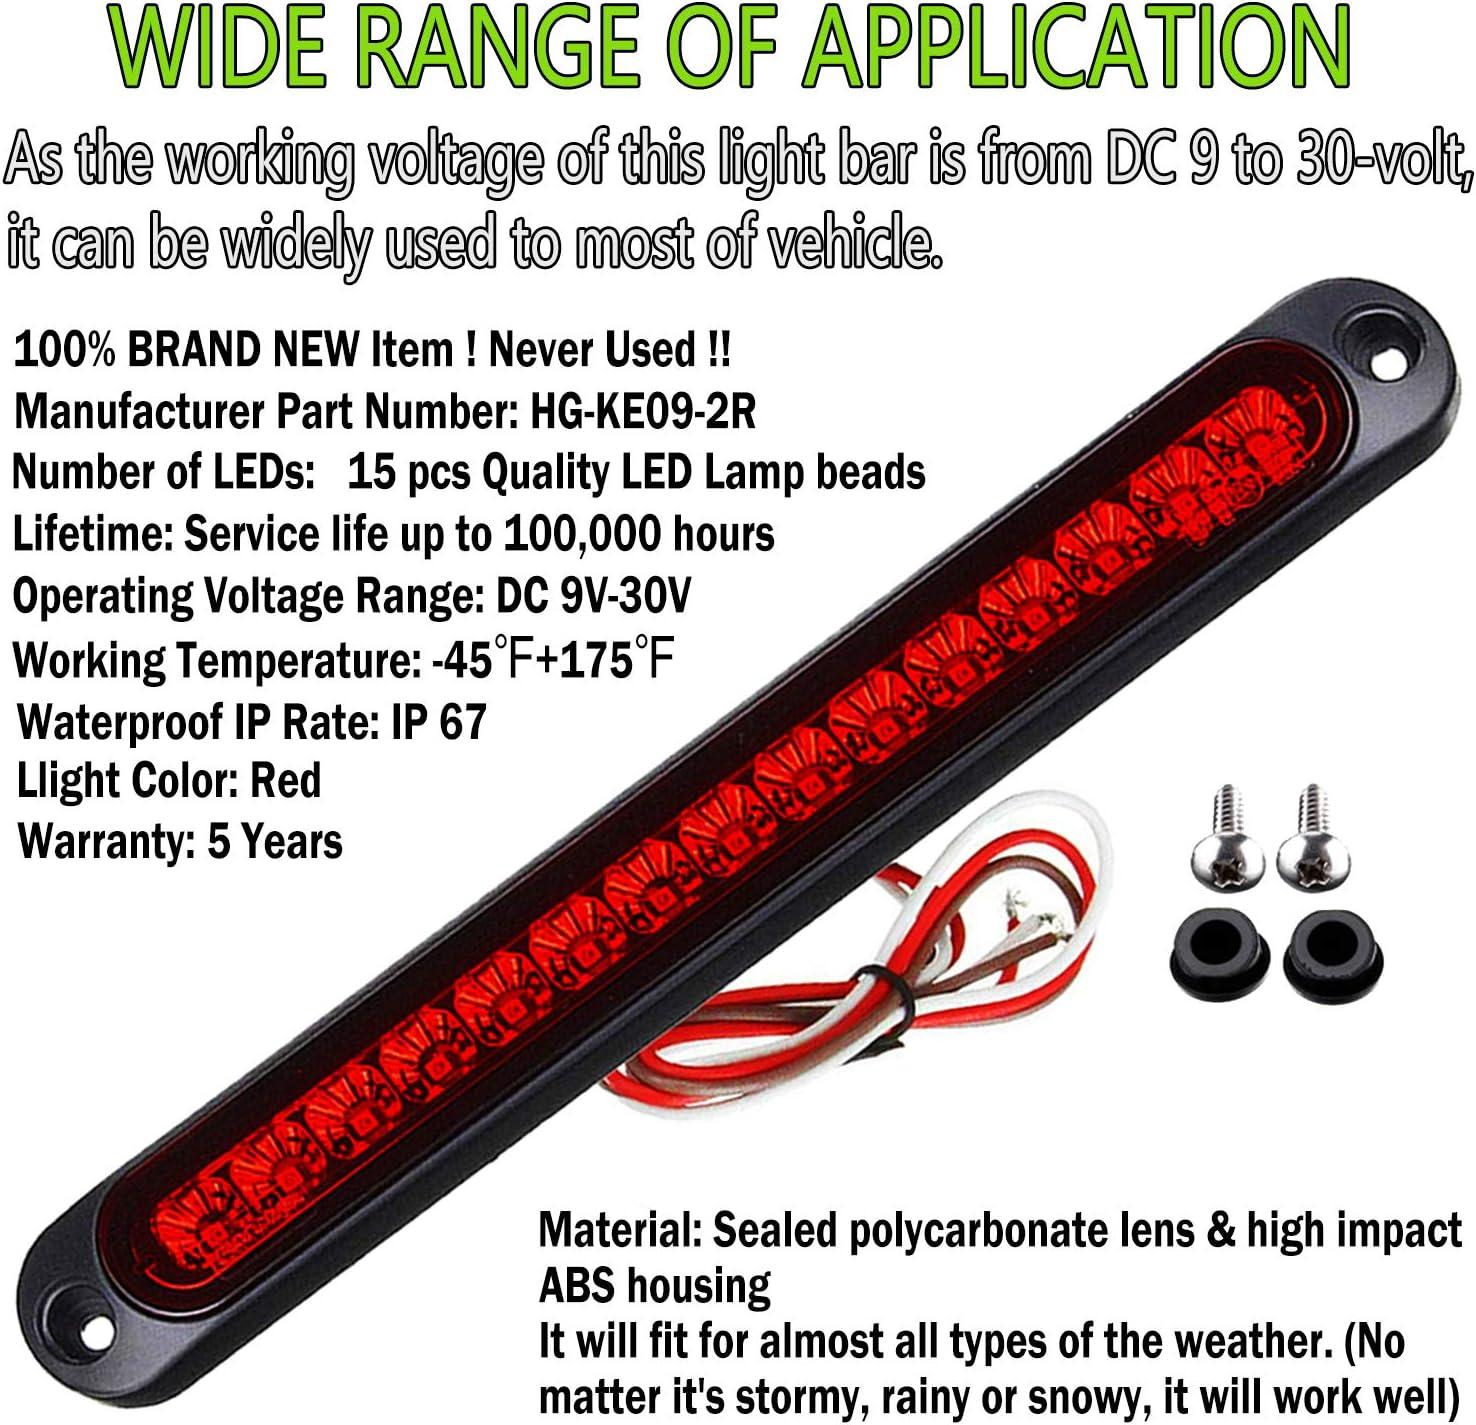 LED Turn Signal Stop Tail Lights Bar Strip Truck Rear Marker ...